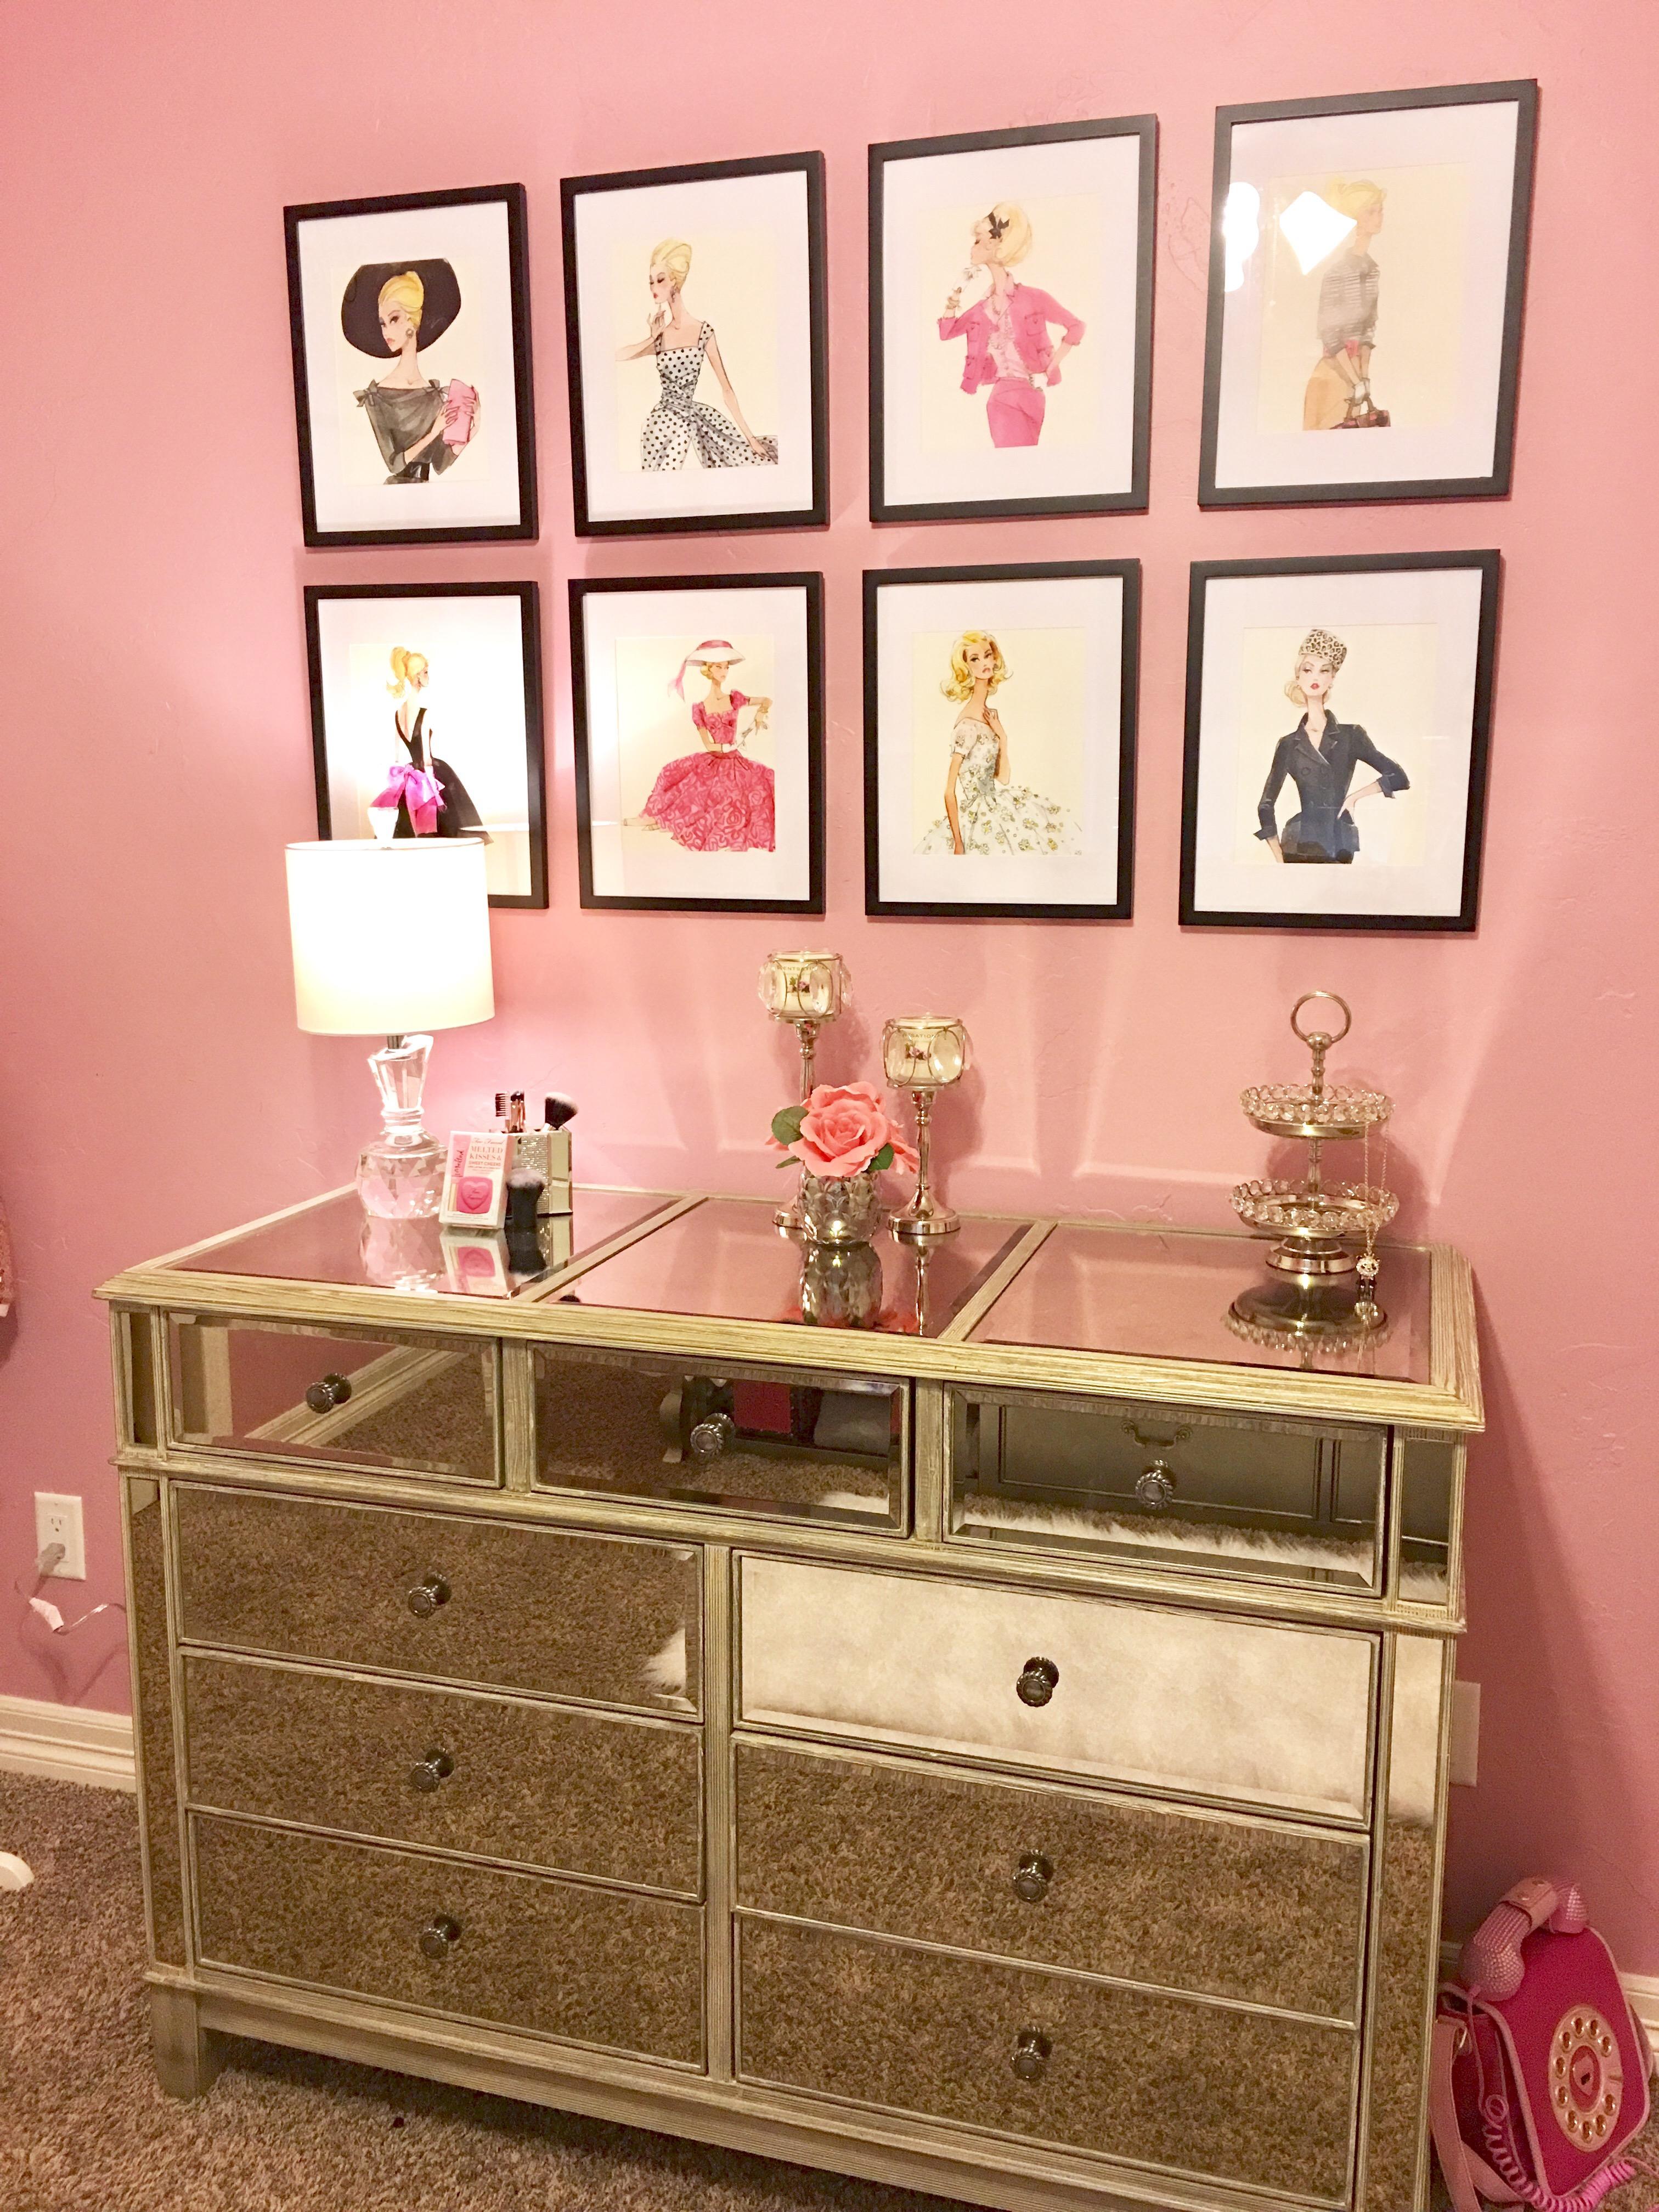 Update On The U201cGoing Glamu201d Bedroom Design